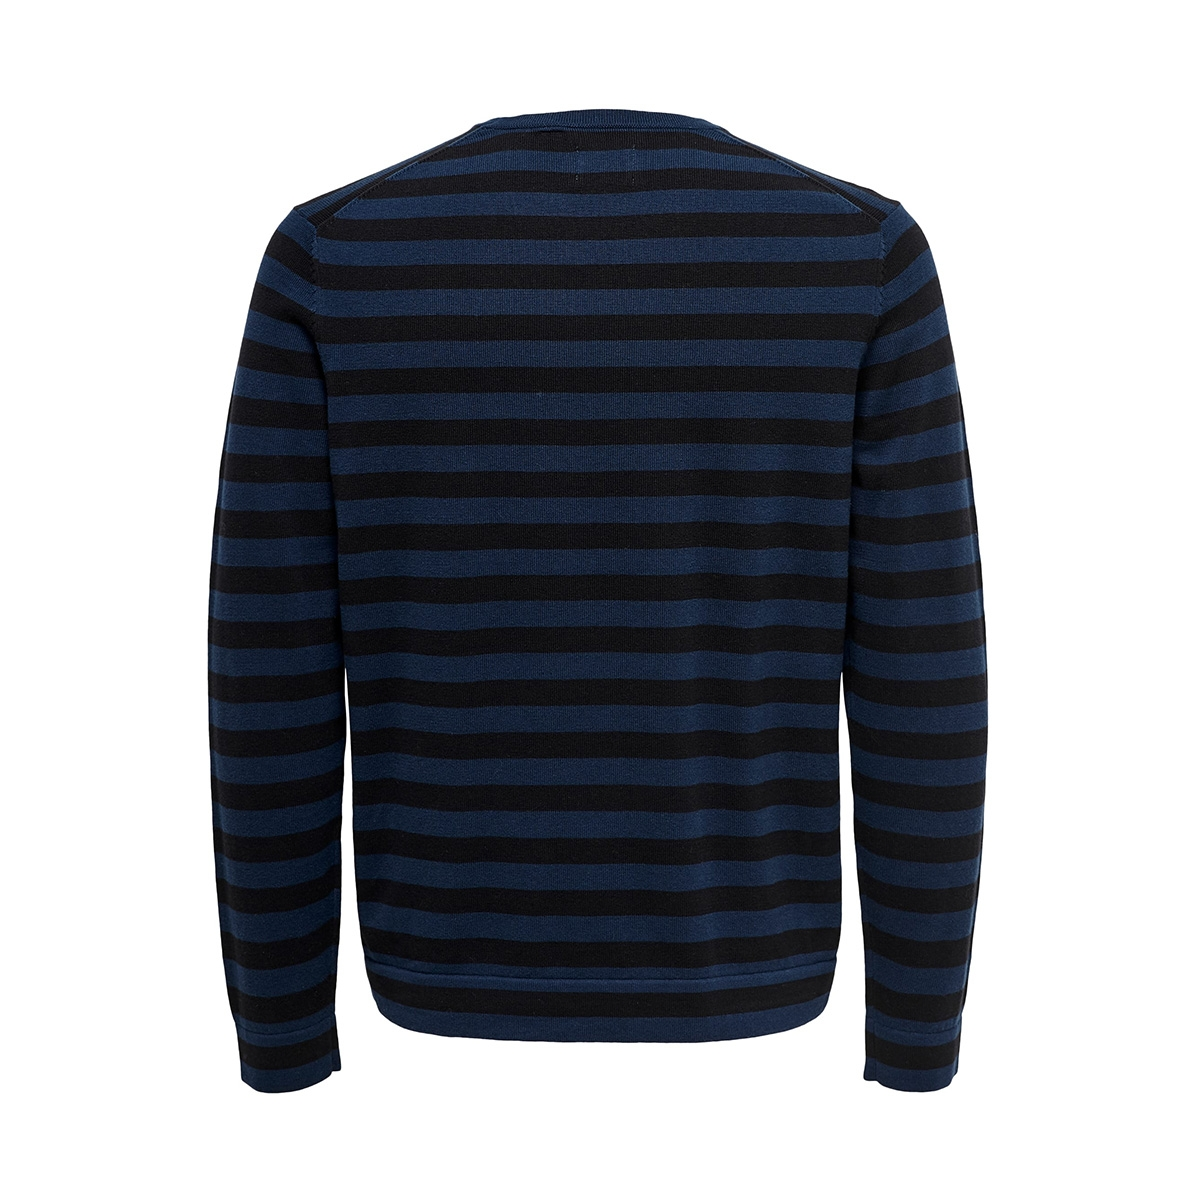 onsalex 12  crew neck knit 22014779 only & sons trui dress blues/black